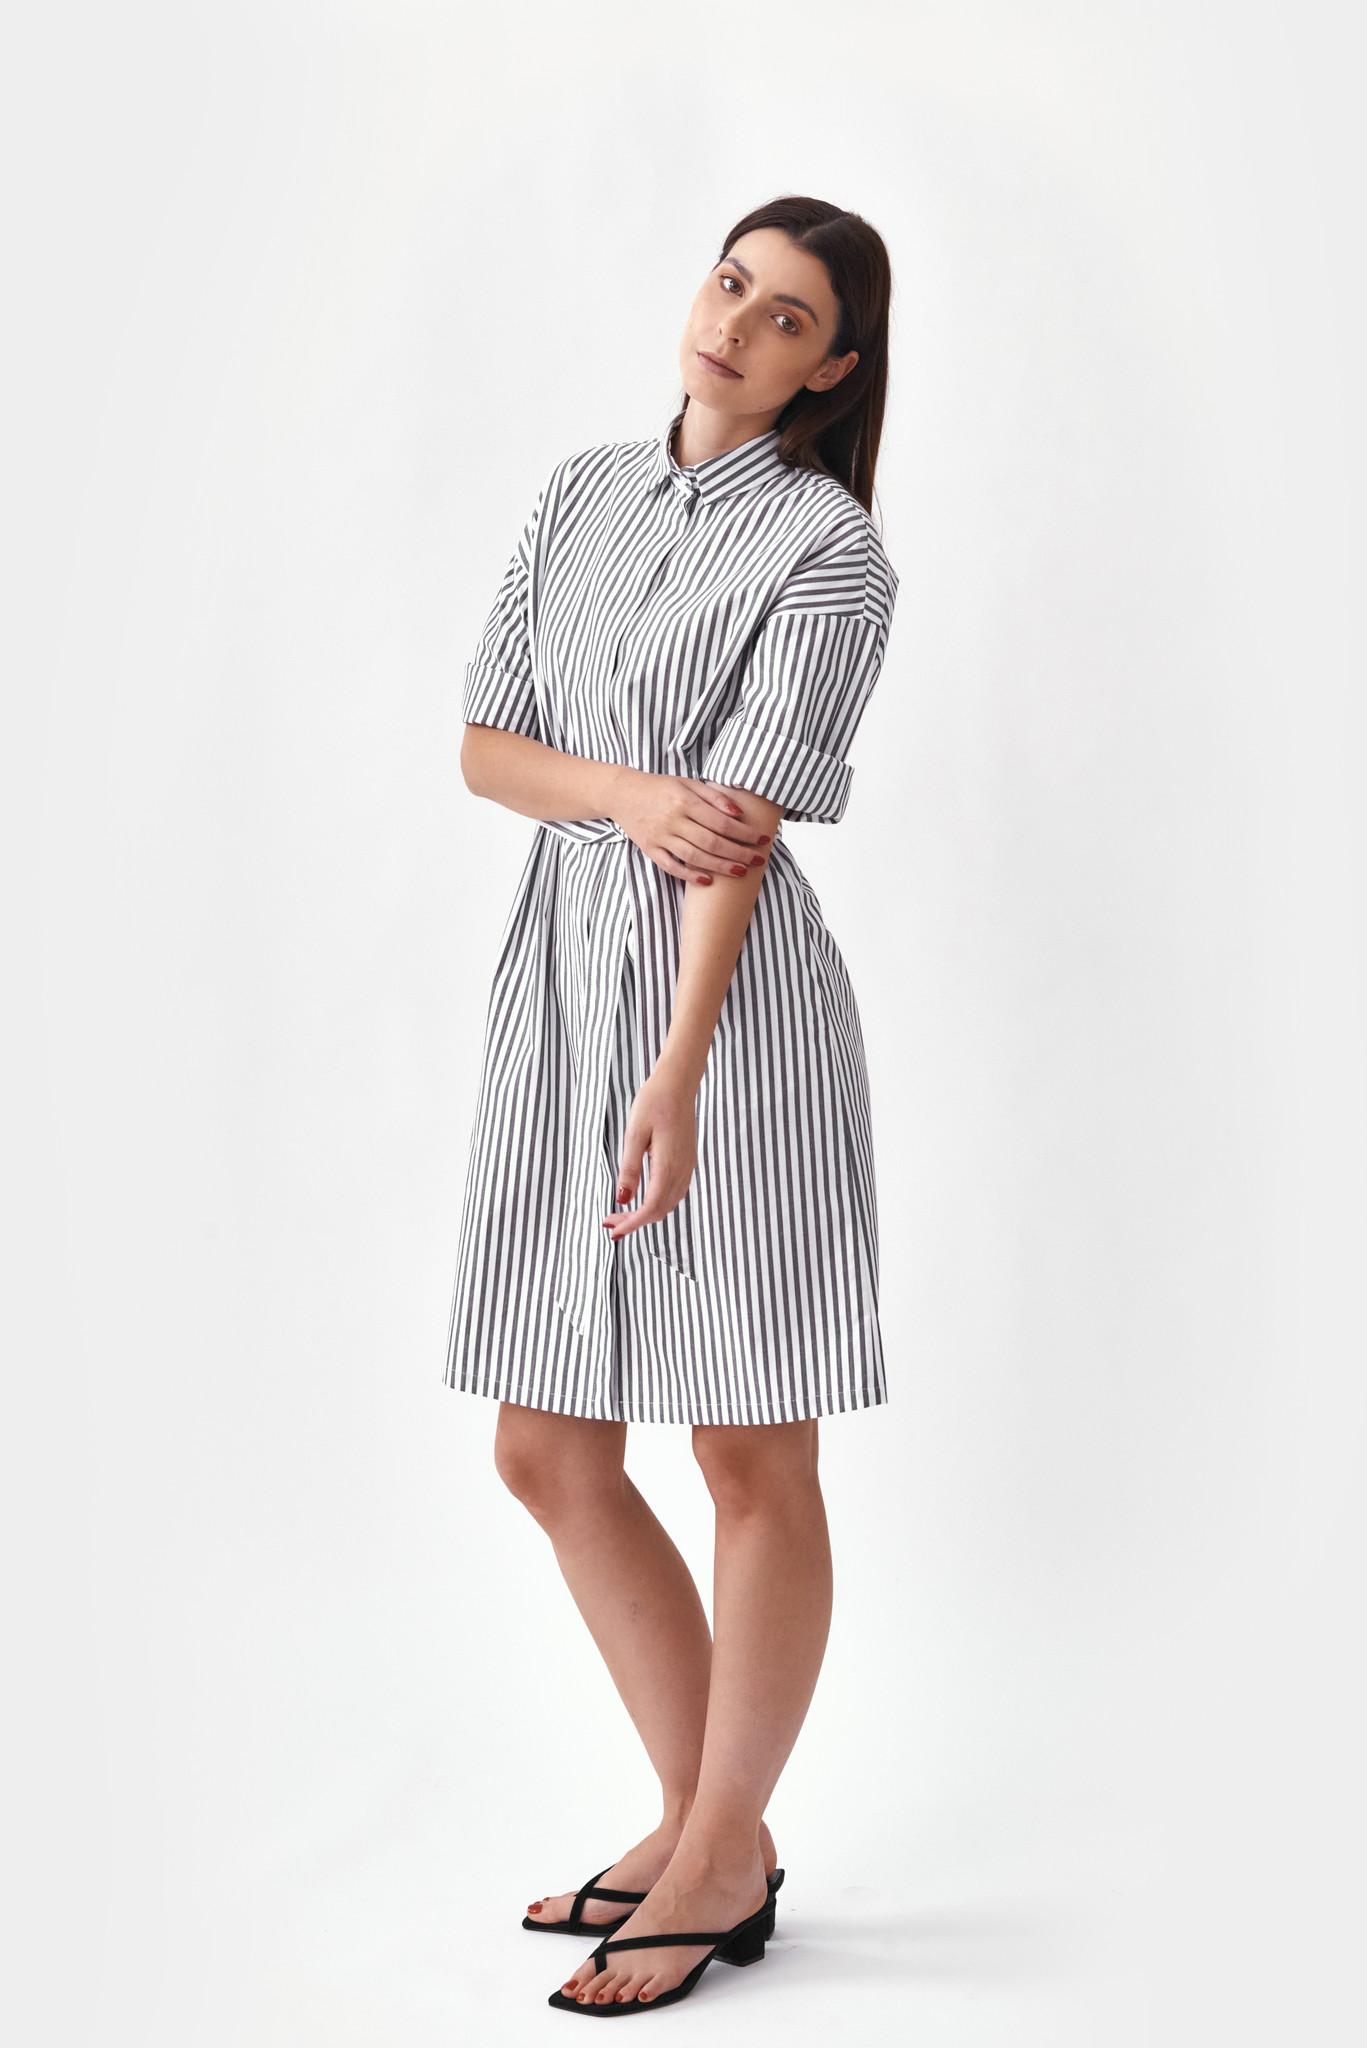 Mila Vert striped shirt dress duurzame mode van biokatoen